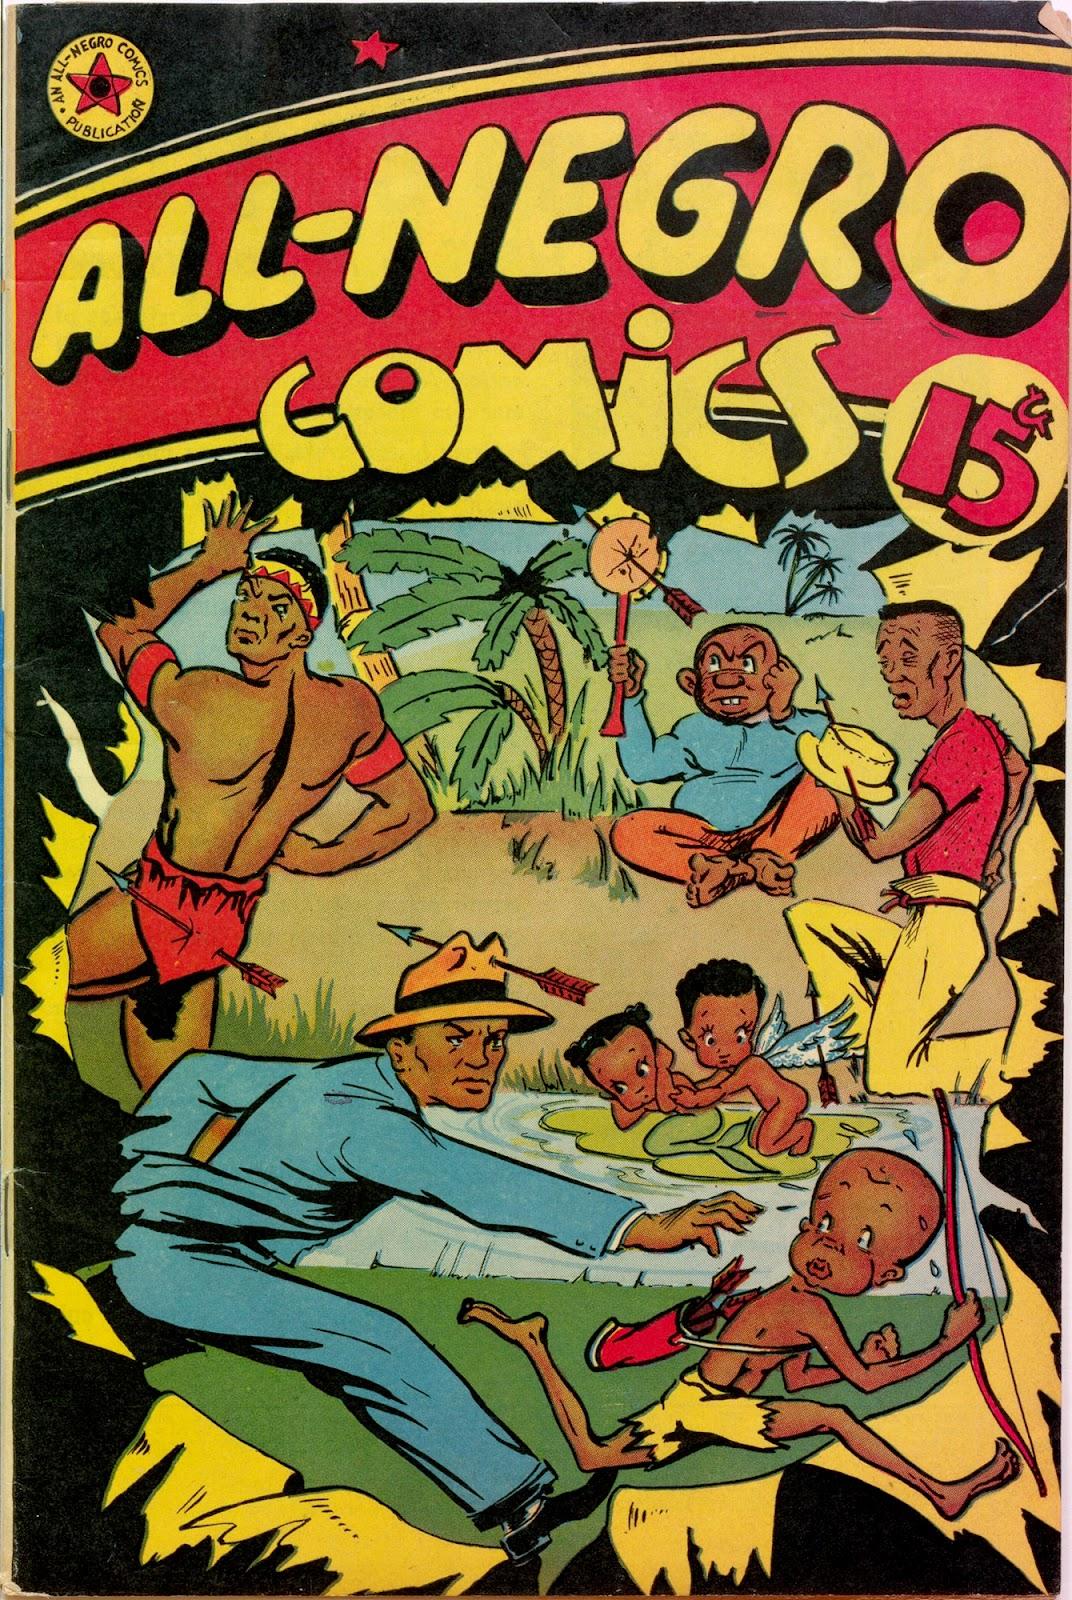 All-Negro Comics Full Page 1